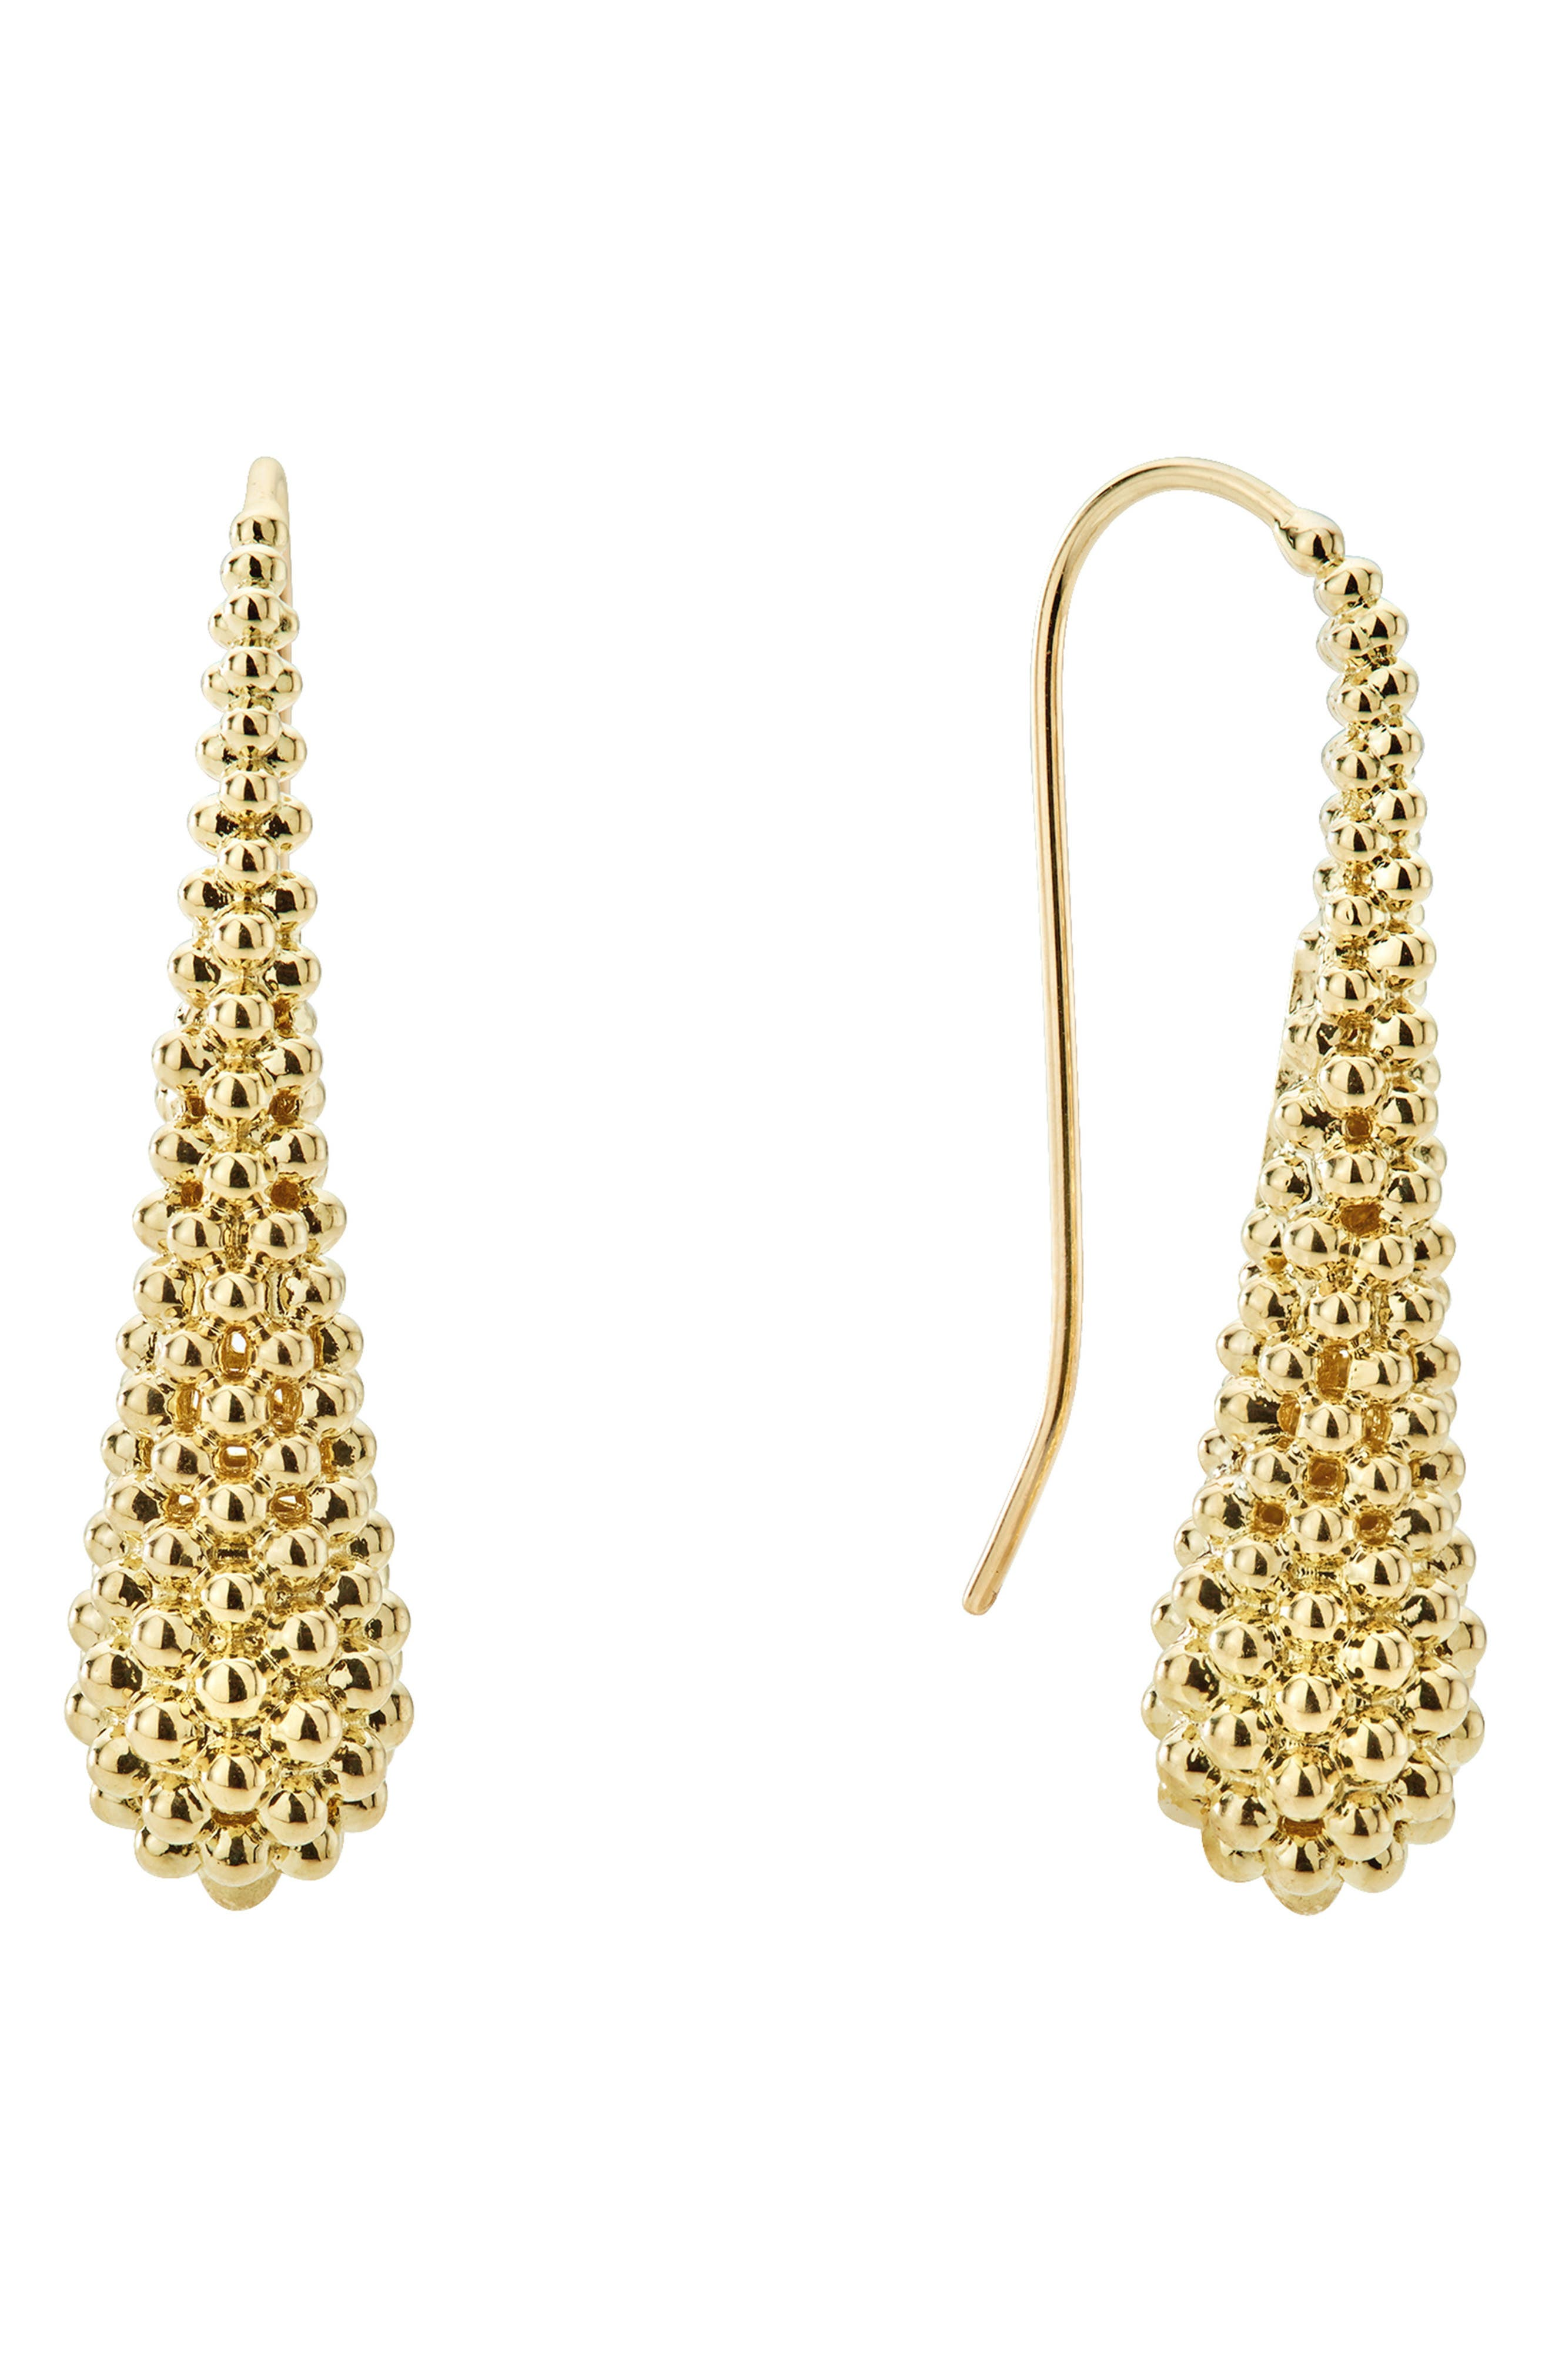 LAGOS Caviar Gold Teardrop Earrings